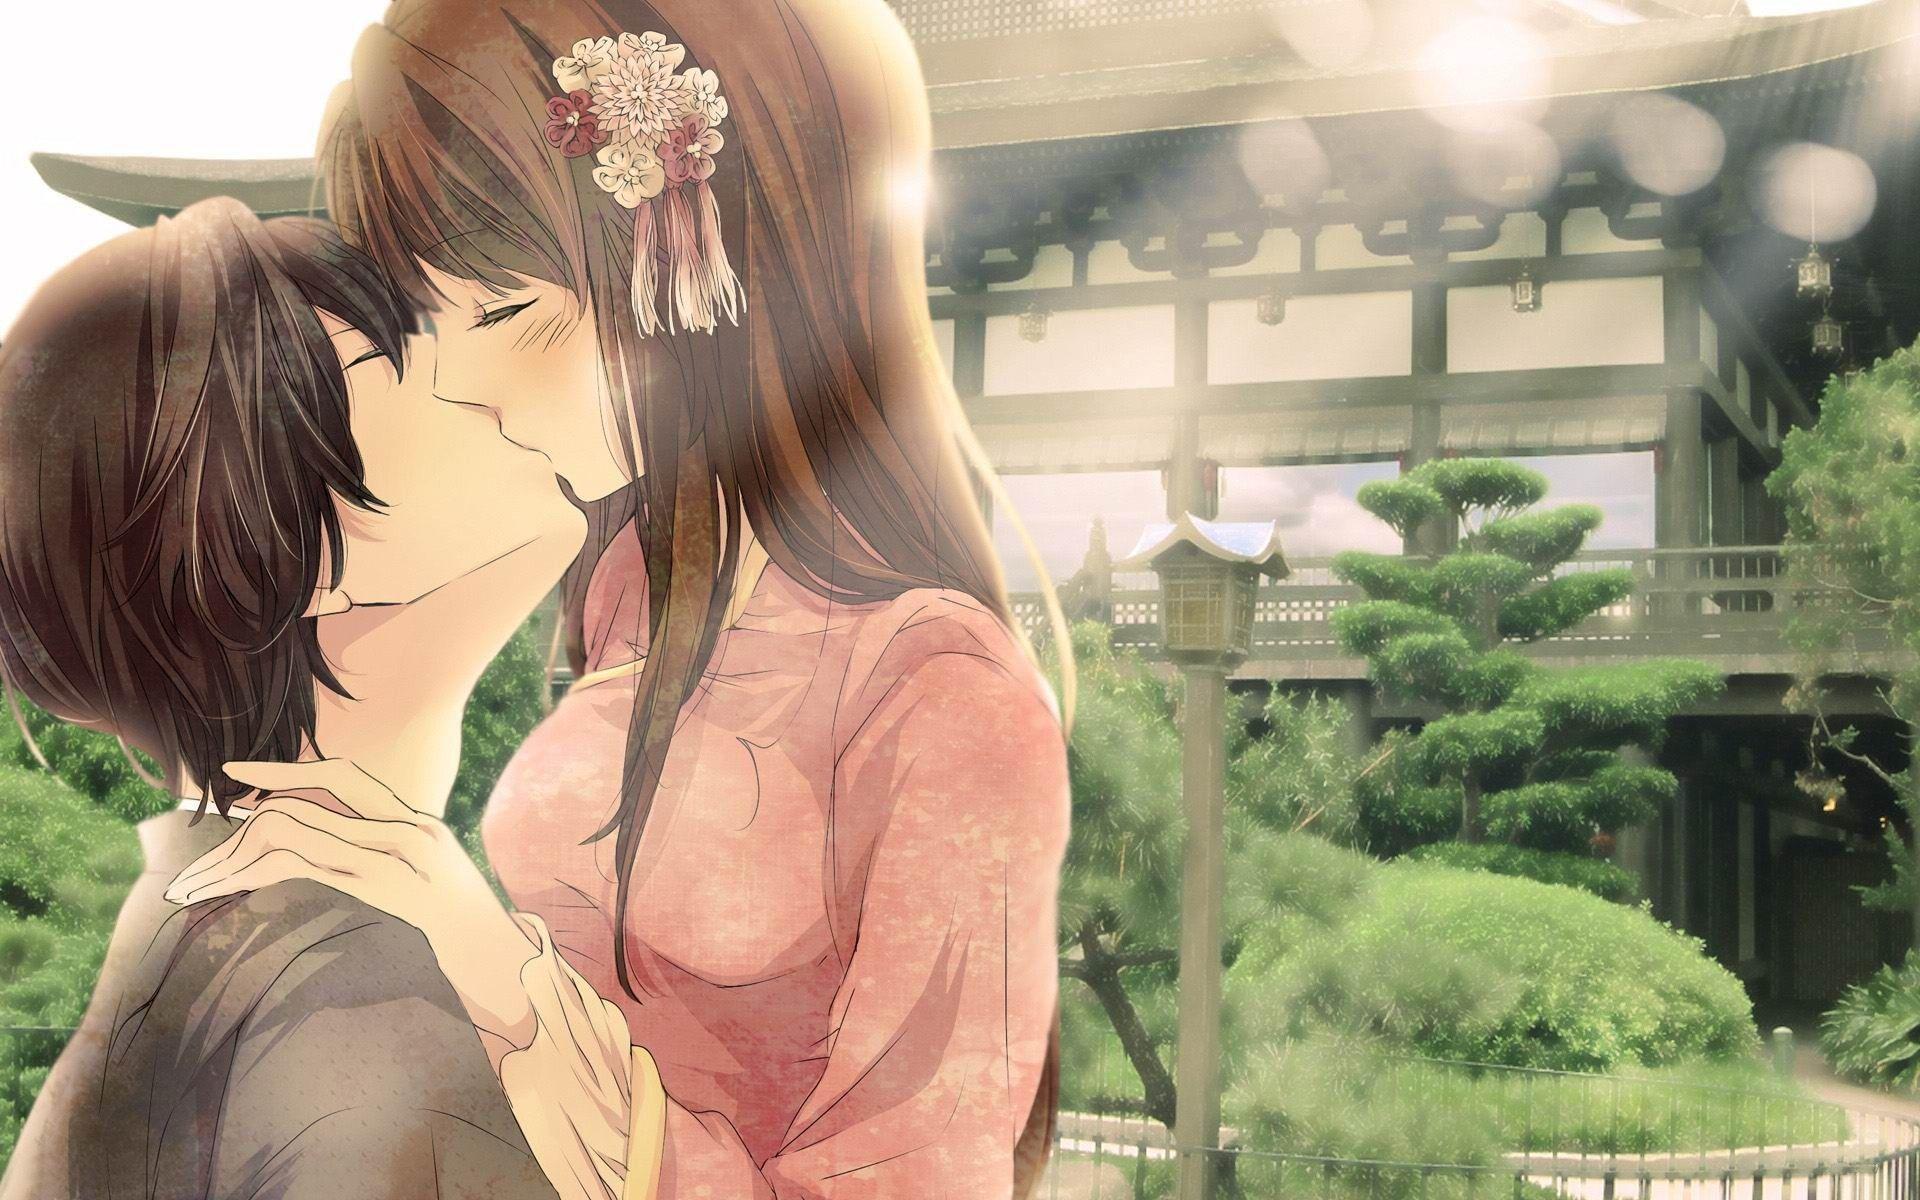 Cute Couple Valentine Anime Wallpapers Desktop Wallpaper Wallpapermine Com Valentines Anime Anime Anime Wallpaper